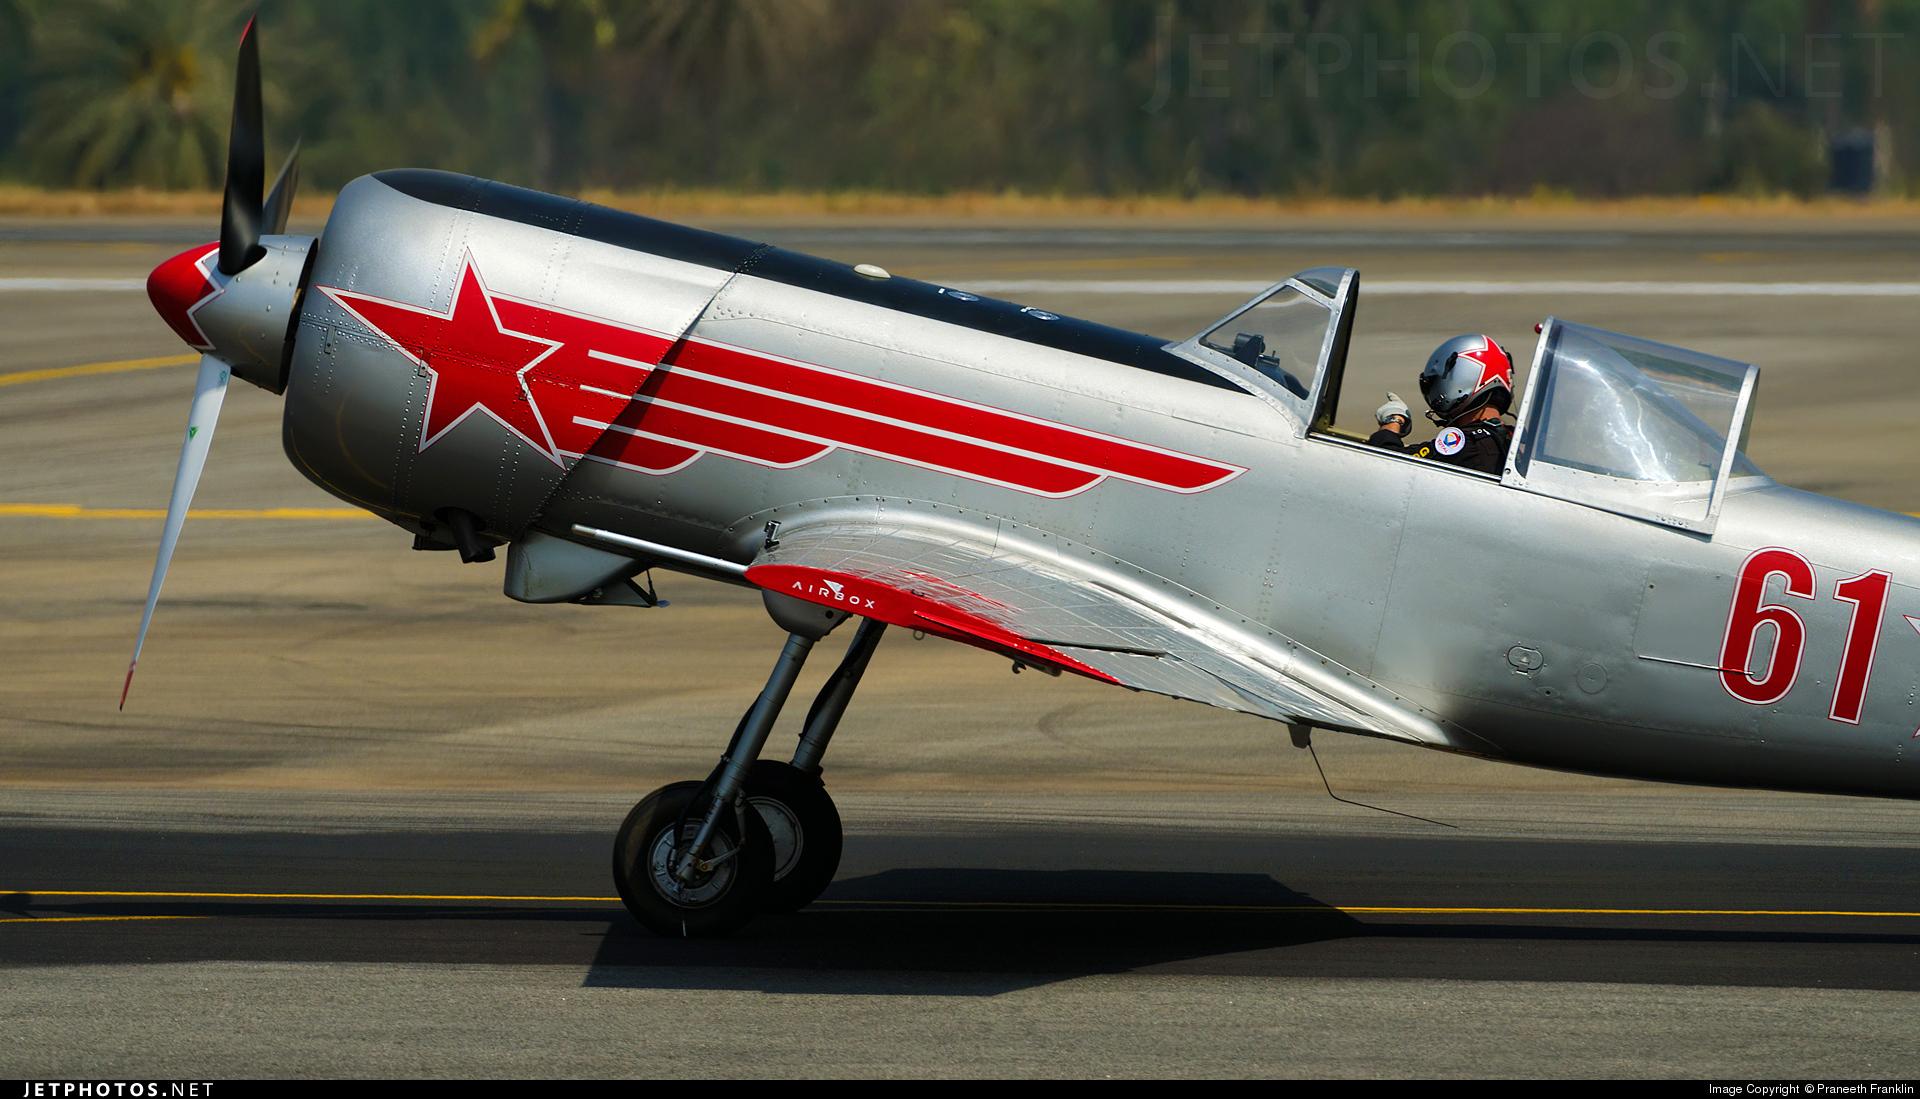 G-YAKZ - Yakovlev Yak-50 - Private